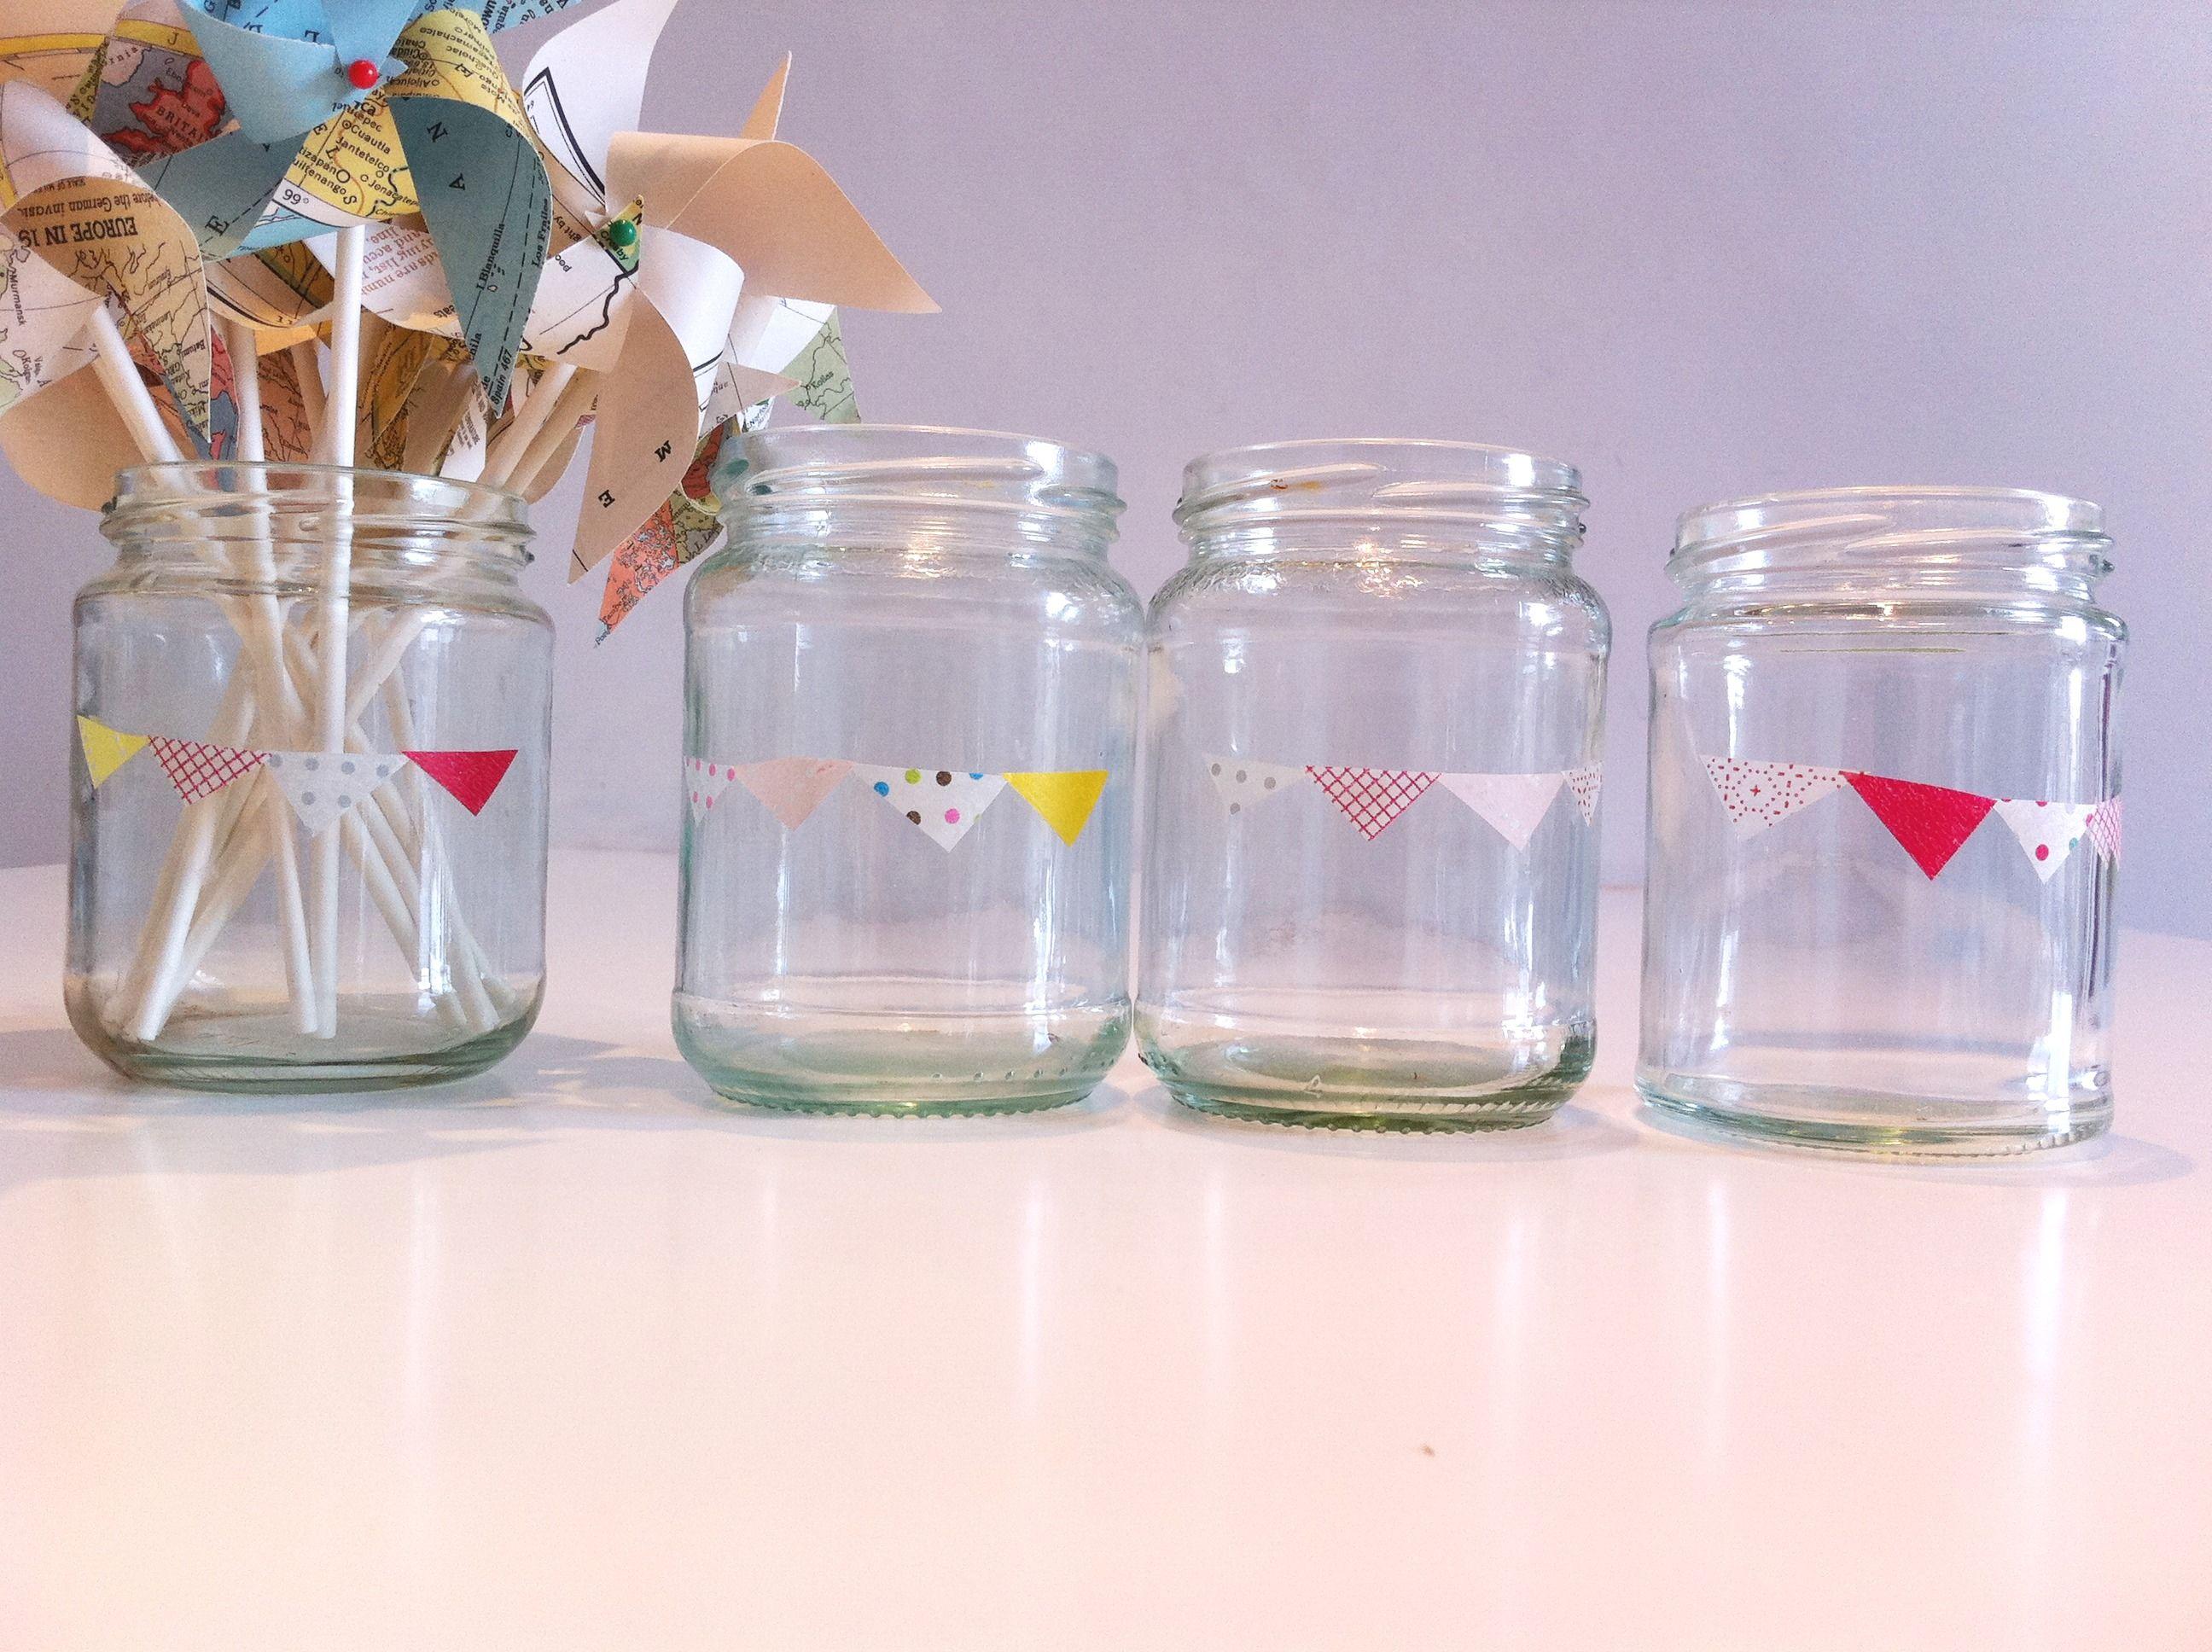 Decorating Jelly Jars I Do Diyjam Jars With Bunting And Hearts Washi Tape  Washi